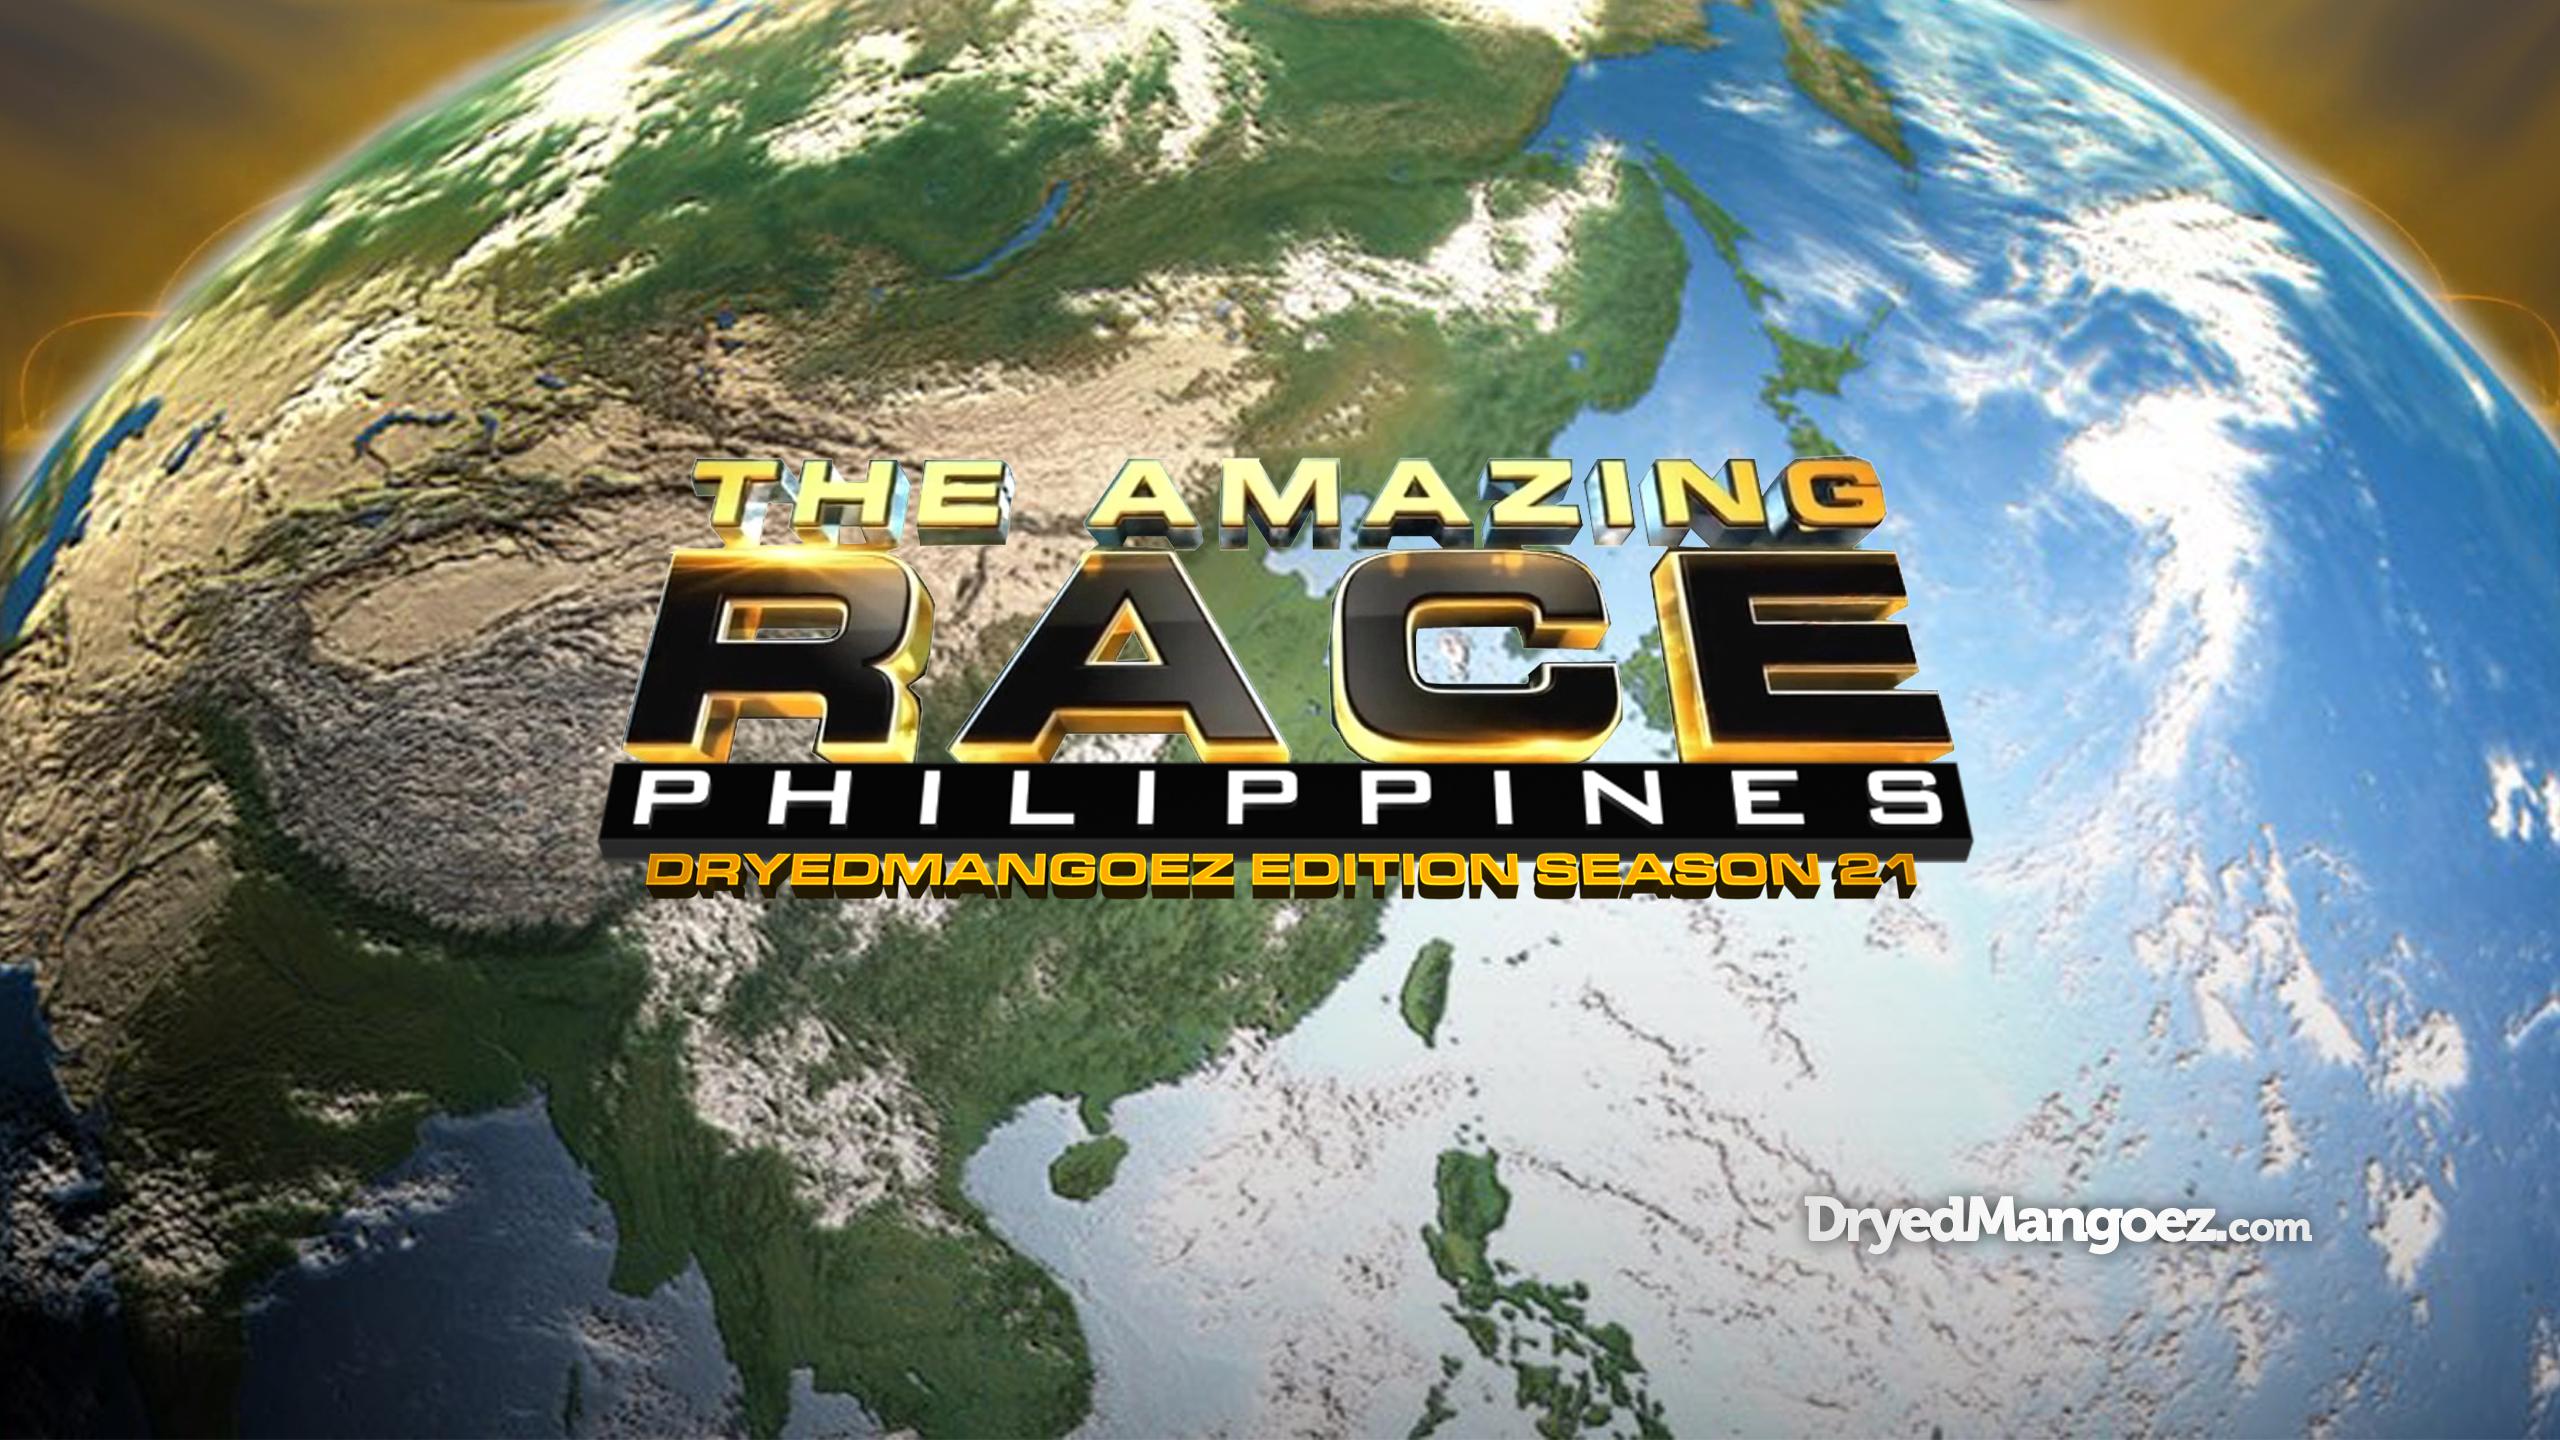 The Amazing Race Philippines: DryedMangoez Edition Season 21